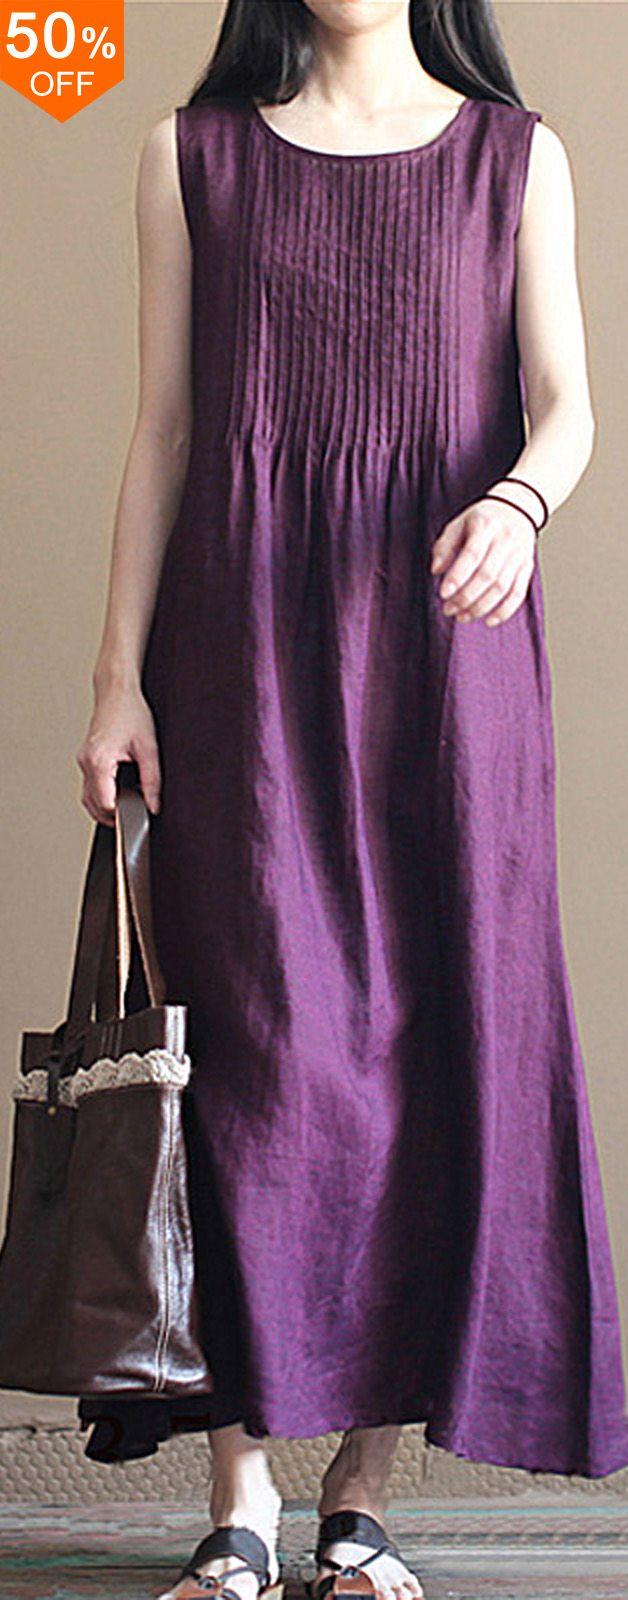 Casual Women Pure Color O-Neck Pleated Cotton Maxi Tank Dress. #women #dress #2018